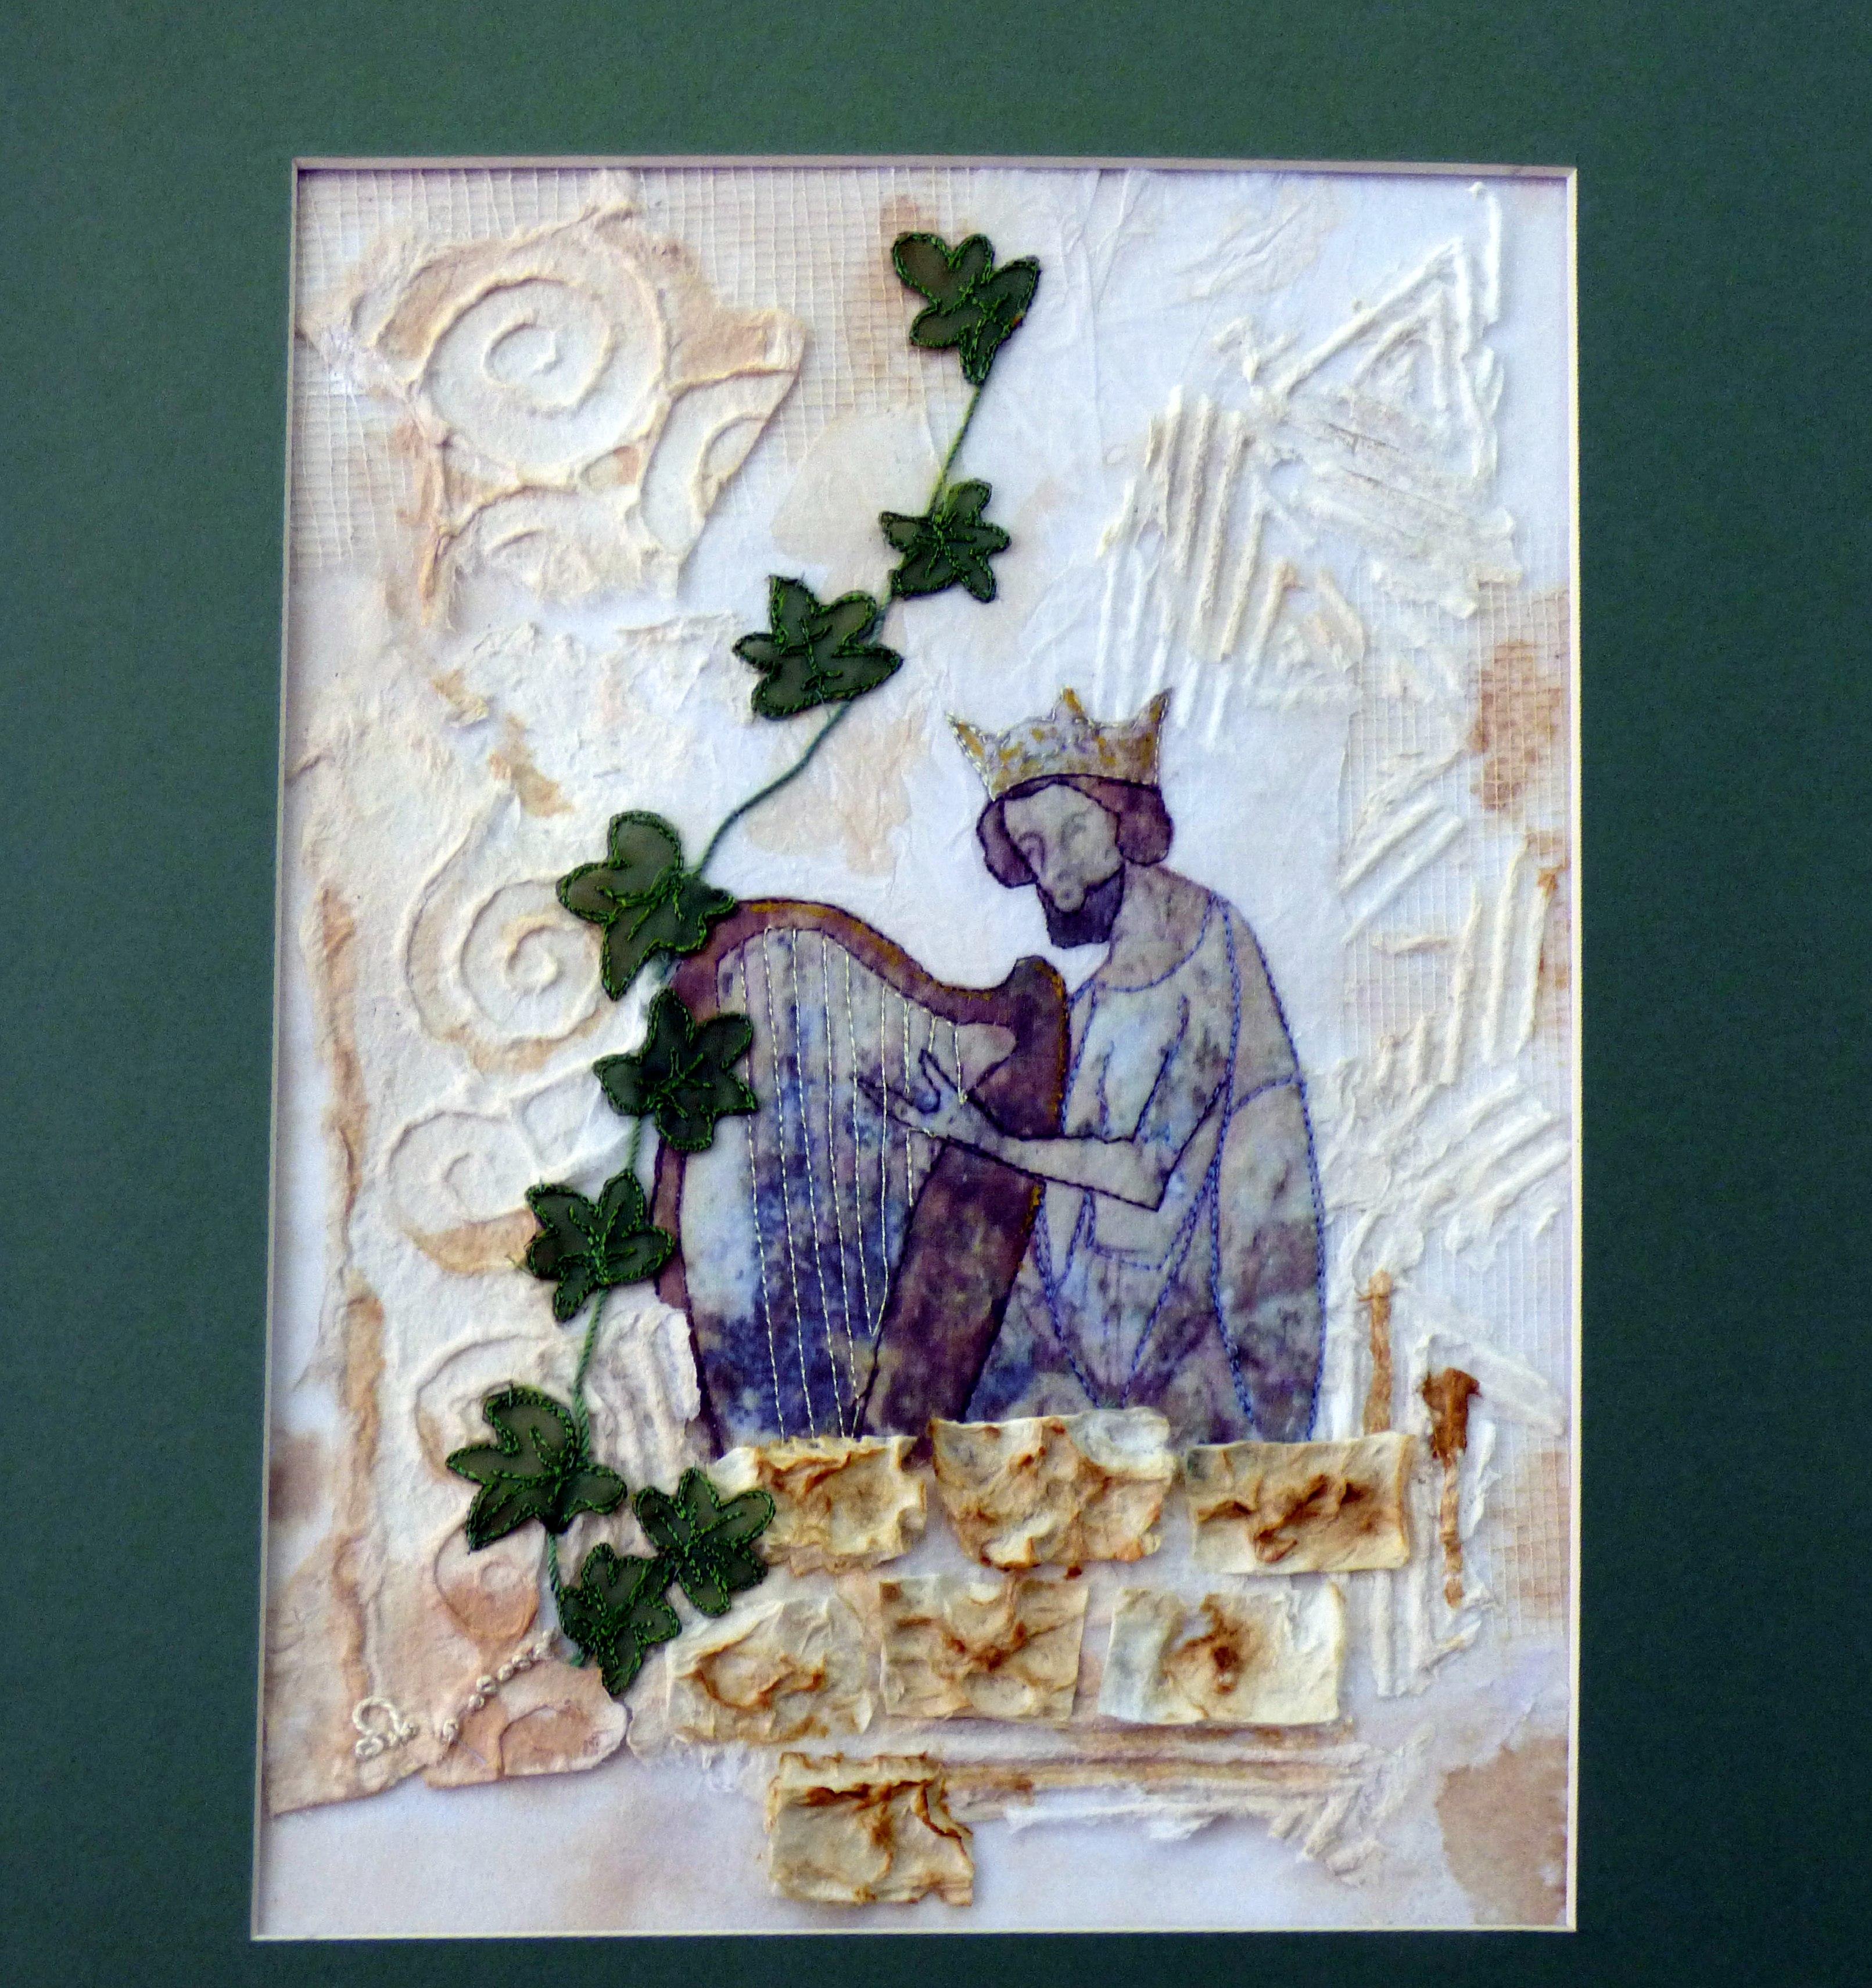 DAVID by Mary Seaman, Parbold EG